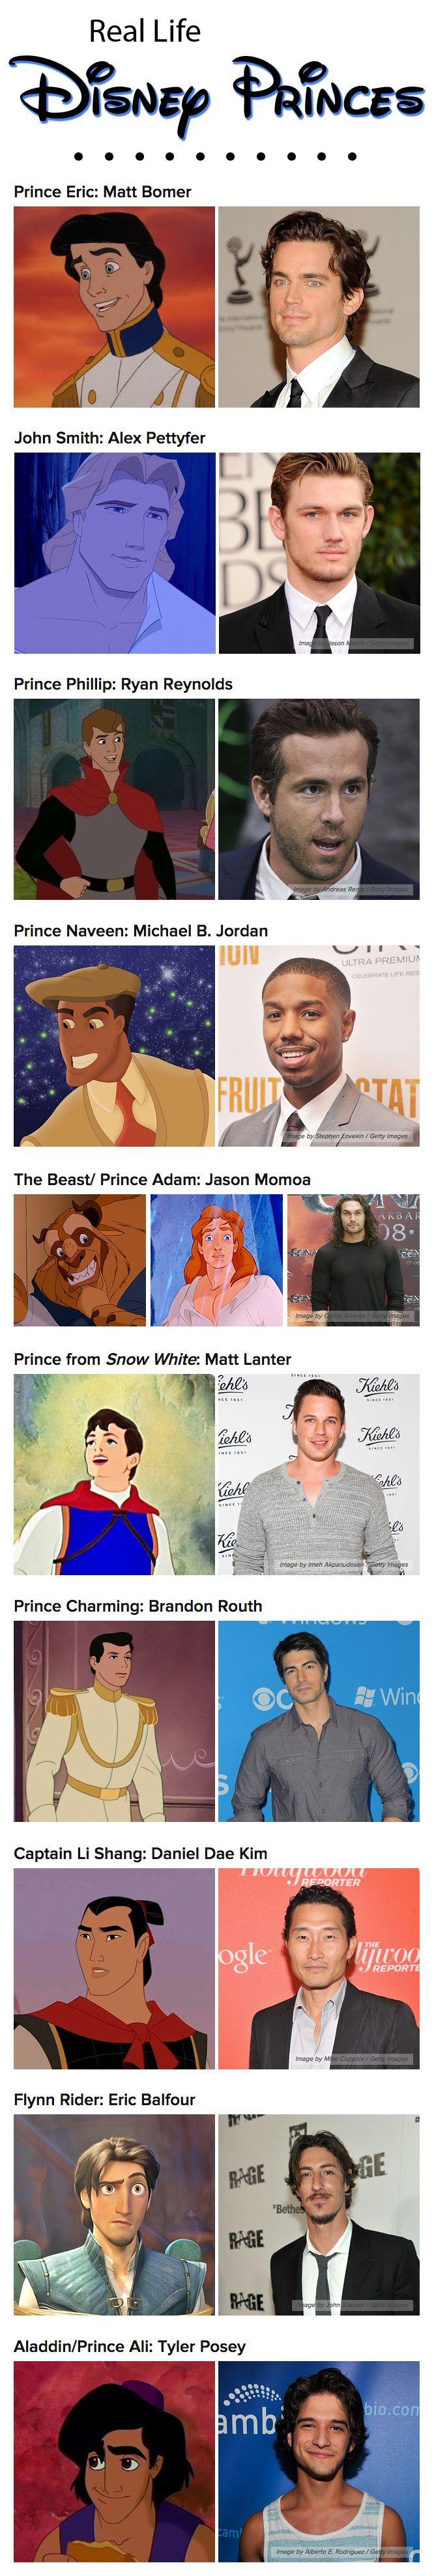 Matt boomer is my prince HOW MUCH BETTER DOES ARIEL GET?!